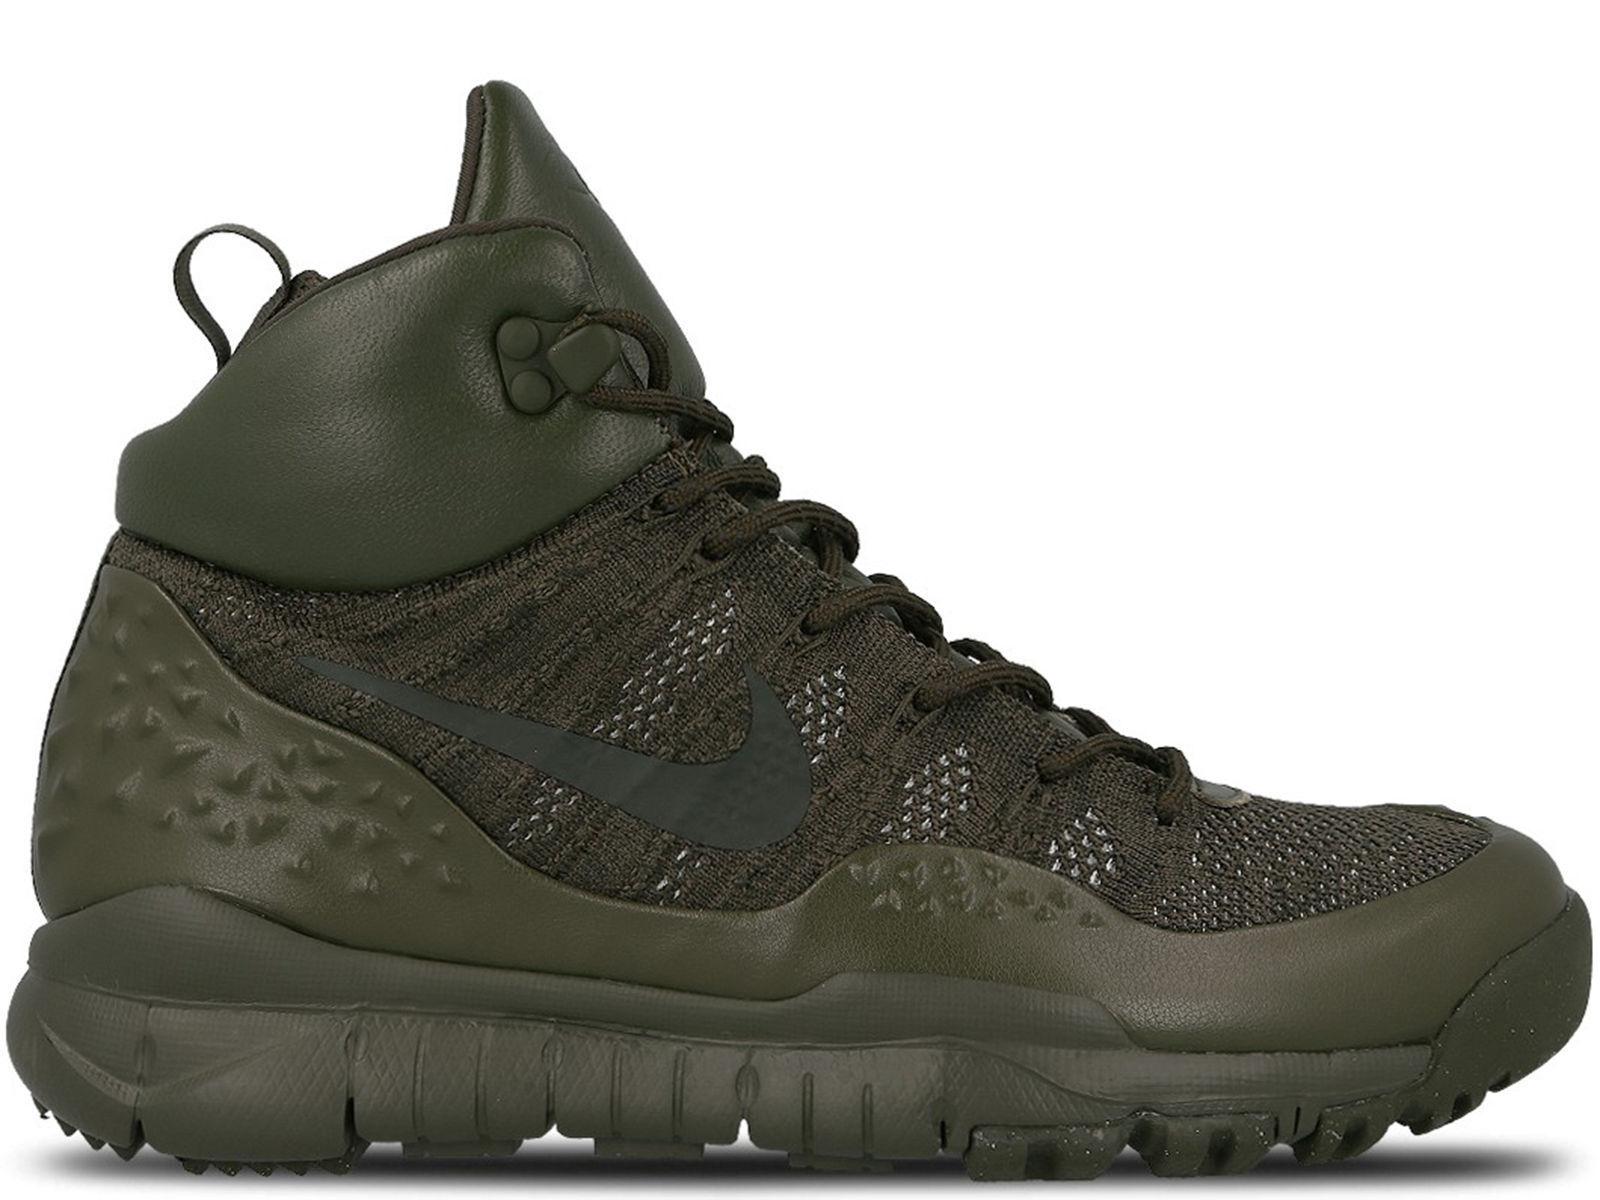 Nike lupinek flyknit carico cachi Uomo 862505-300 dimensioni 11,5 scarpe boot 862505-300 Uomo nuova 250 434b37